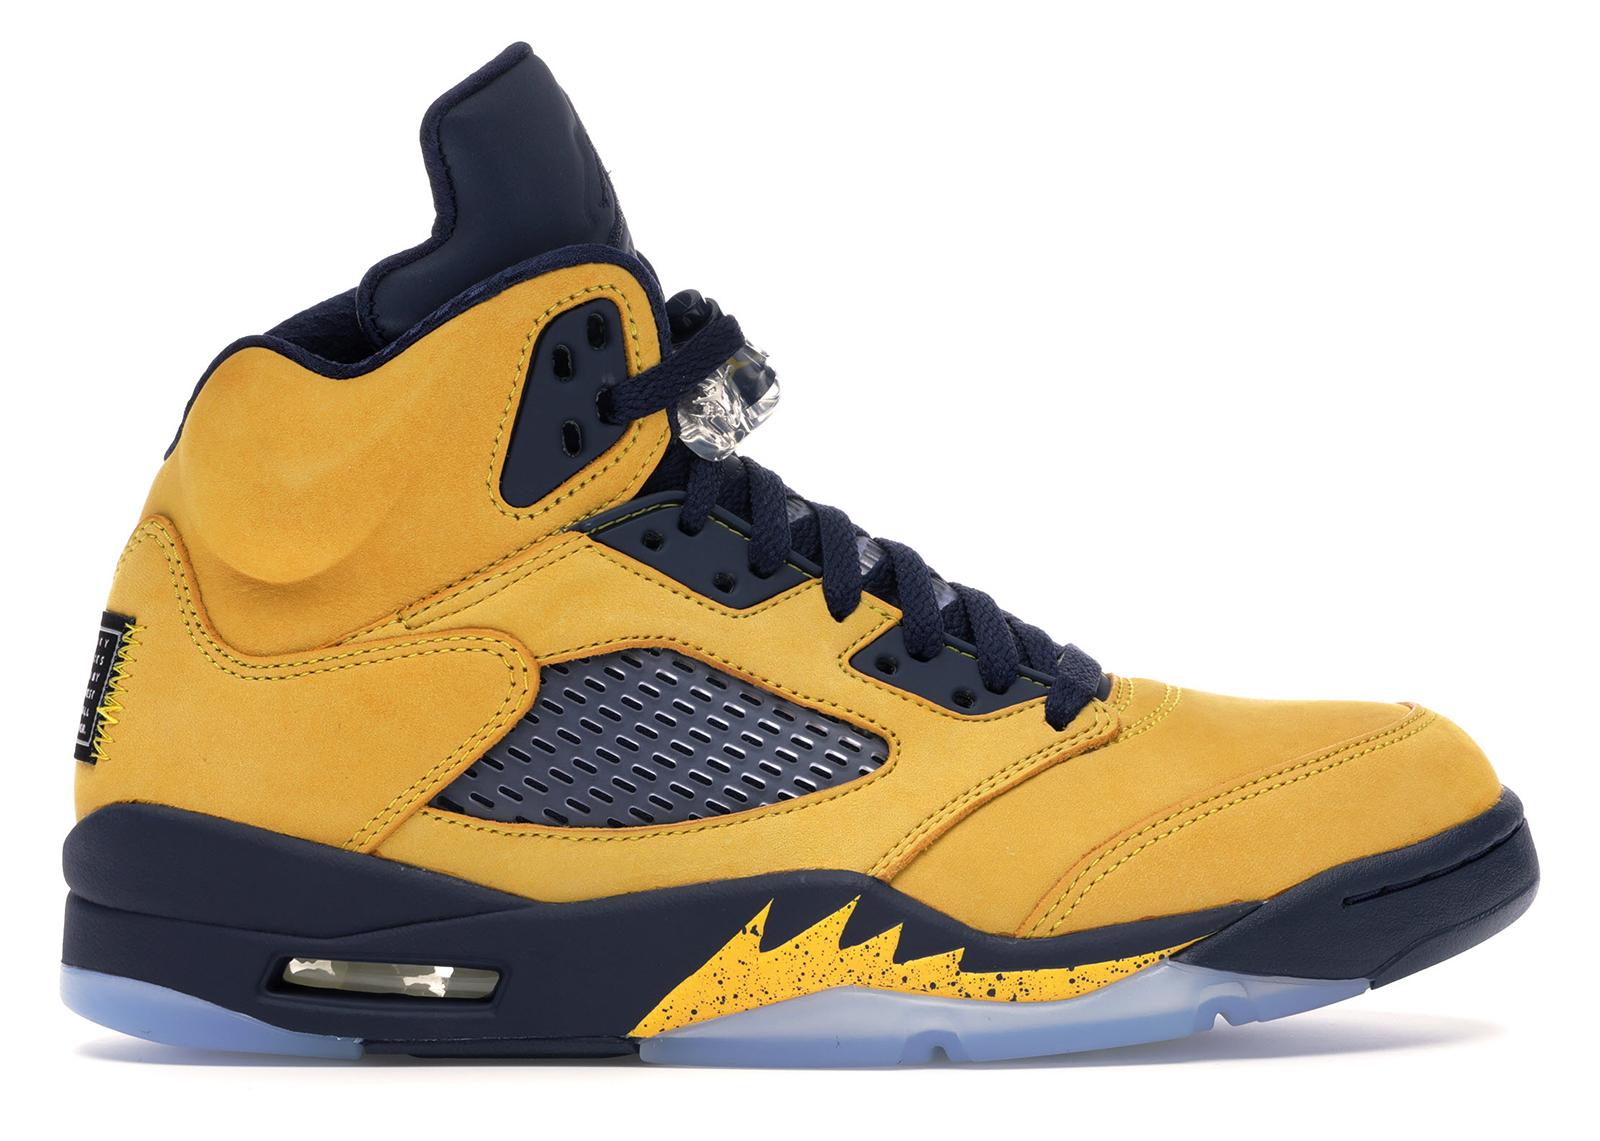 Jordan 5 - All Sizes & Colorways at StockX